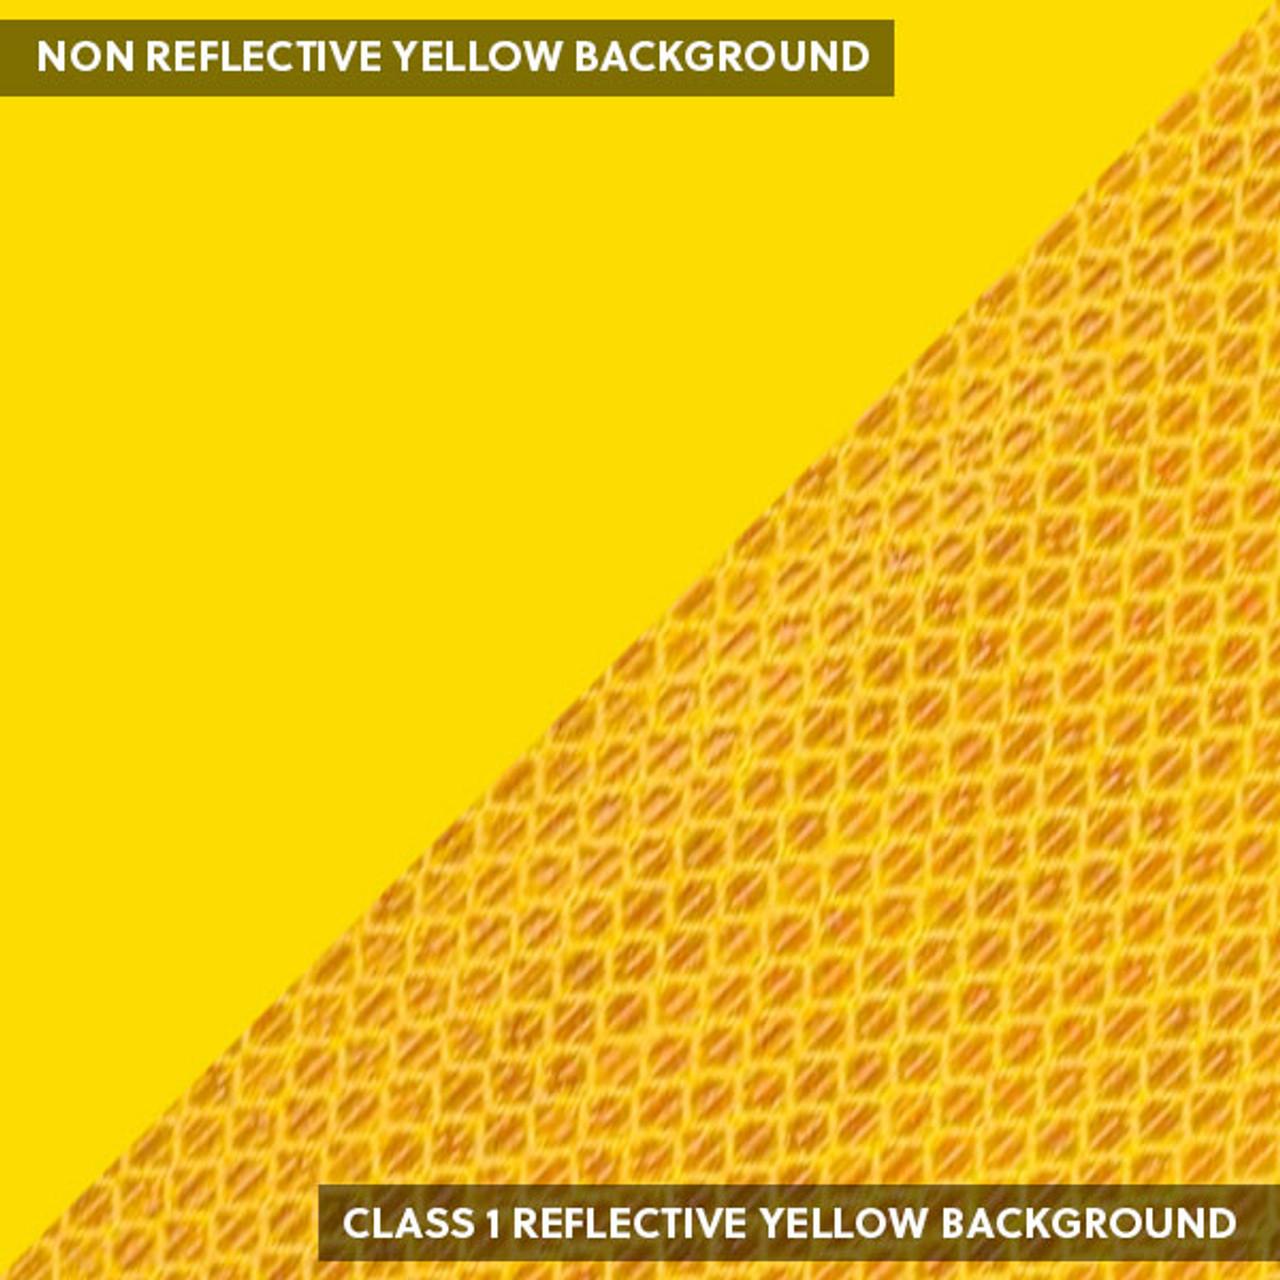 Class 1 Reflective yellow background or standard flat warning yellow